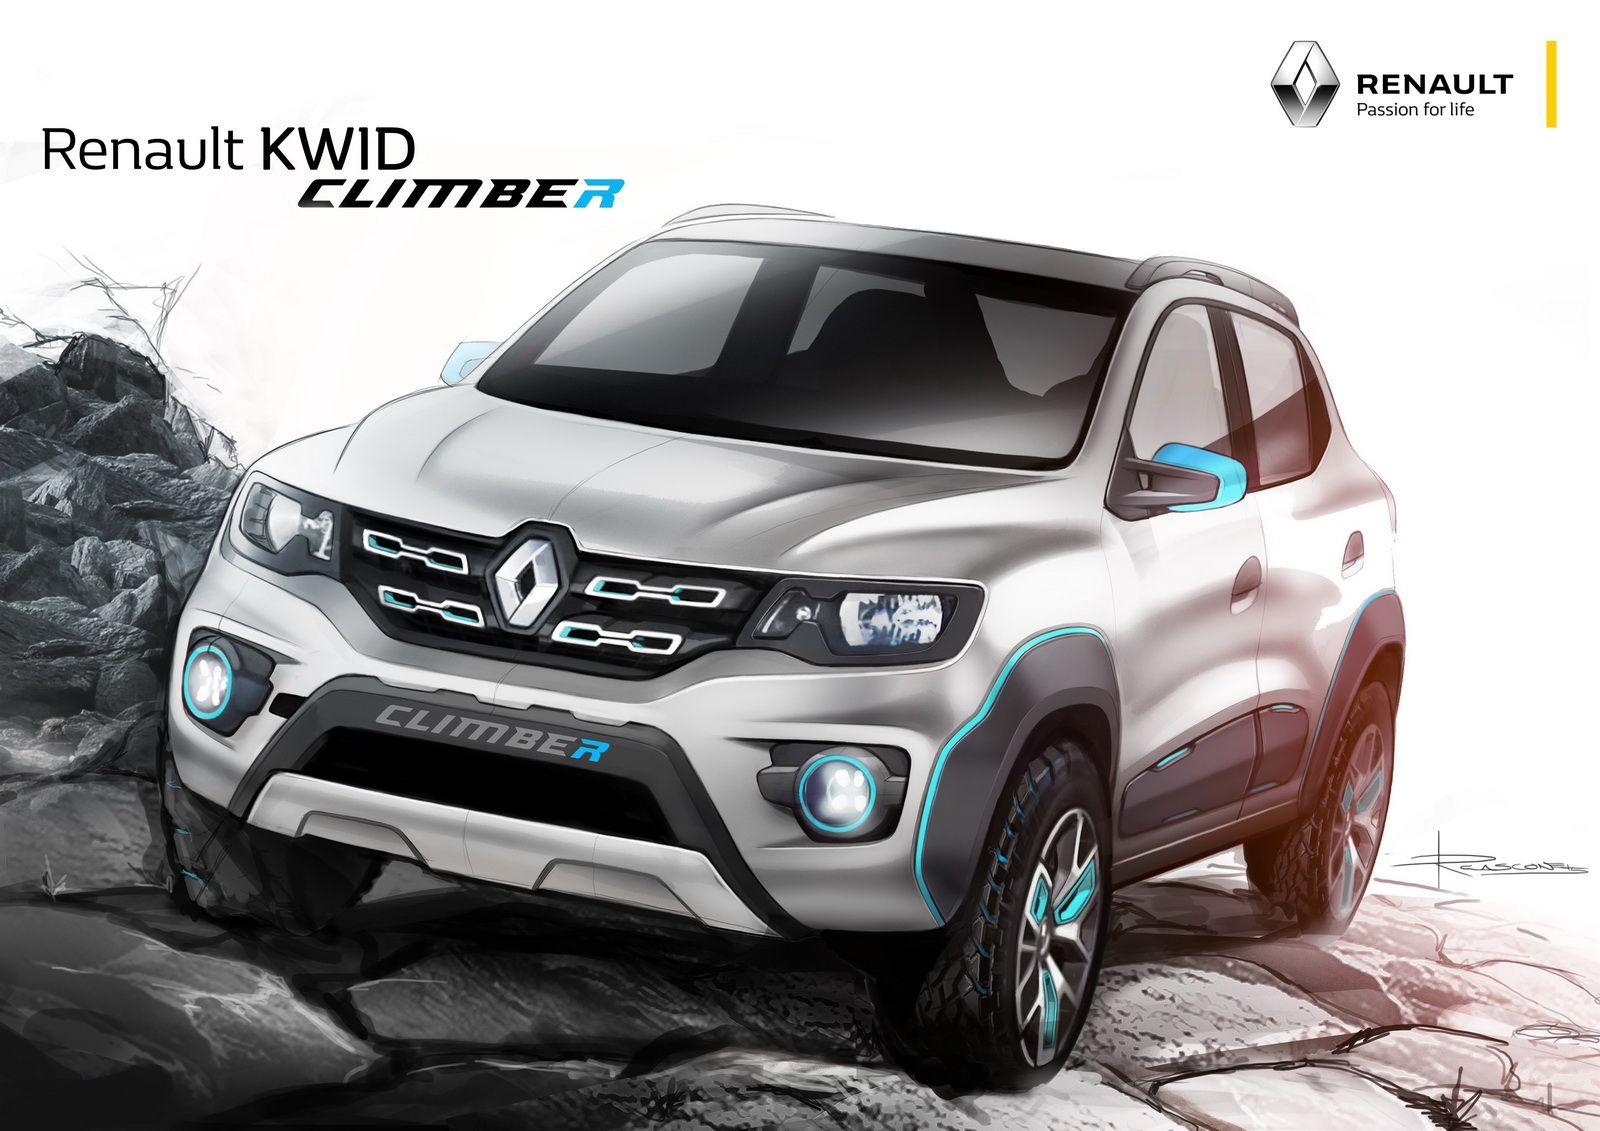 Renault Reveals Kwid Racer And Kwid Climber Studies At Delhi Auto Show Carscoops Renault Car Design Sketch Car